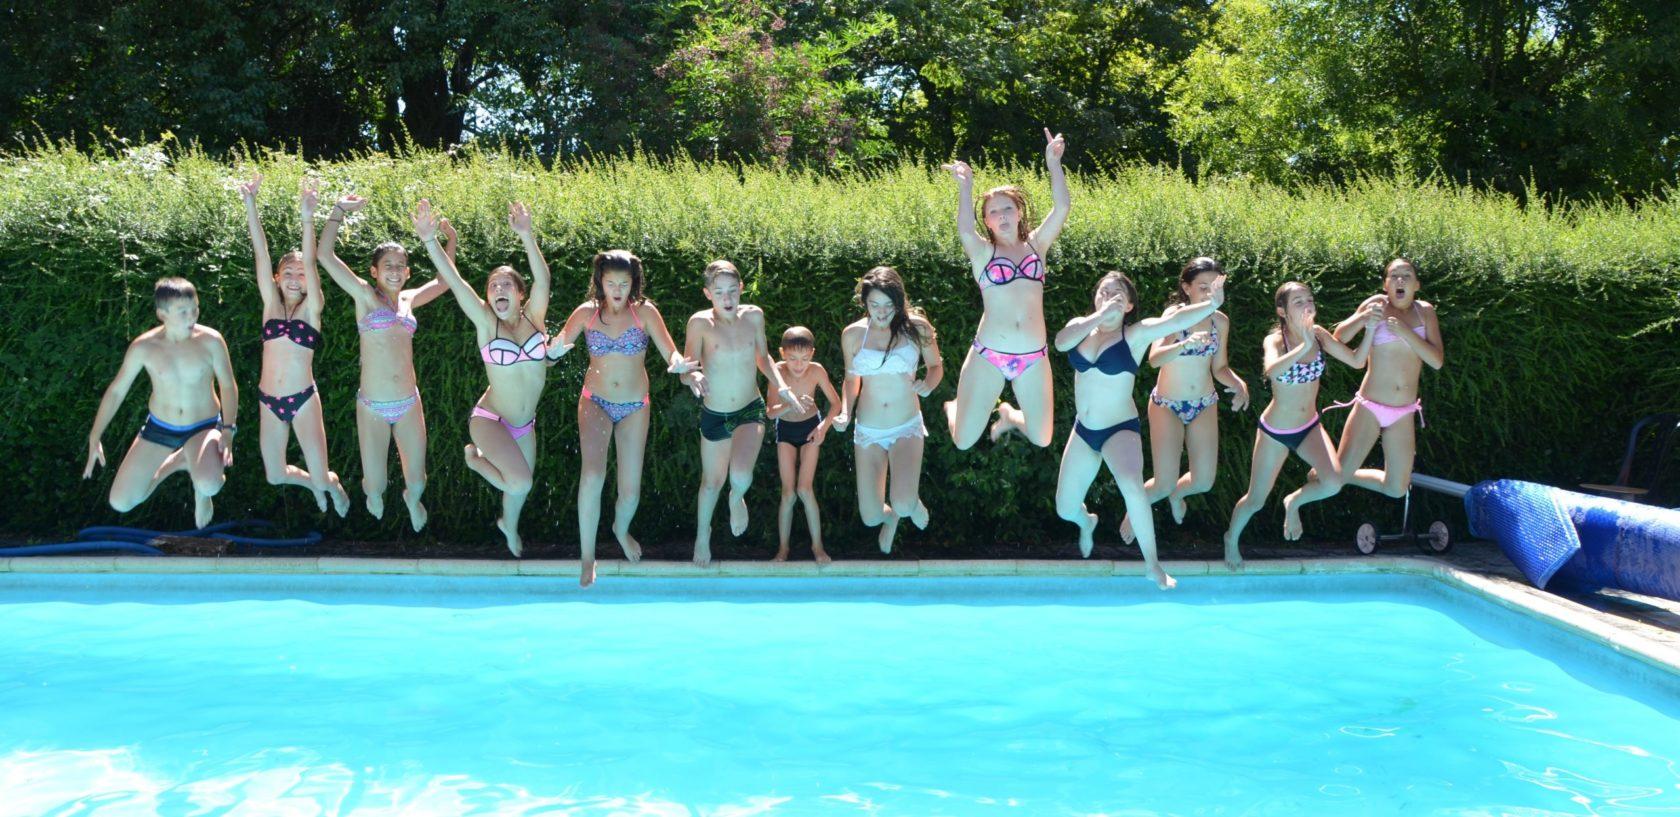 Séjour baigande équitation piscine